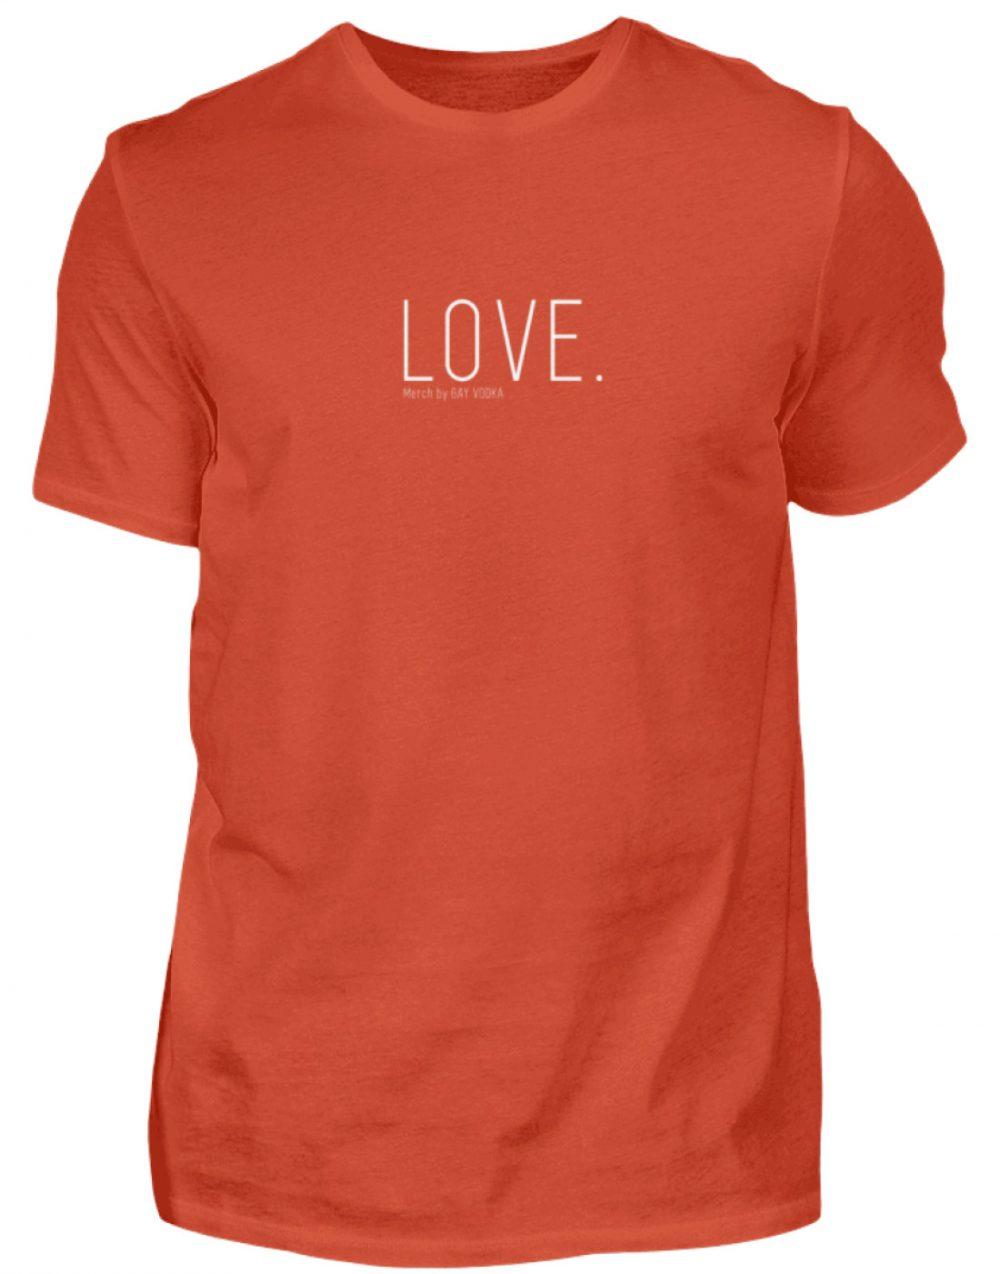 LOVE. - Herren Shirt-1236